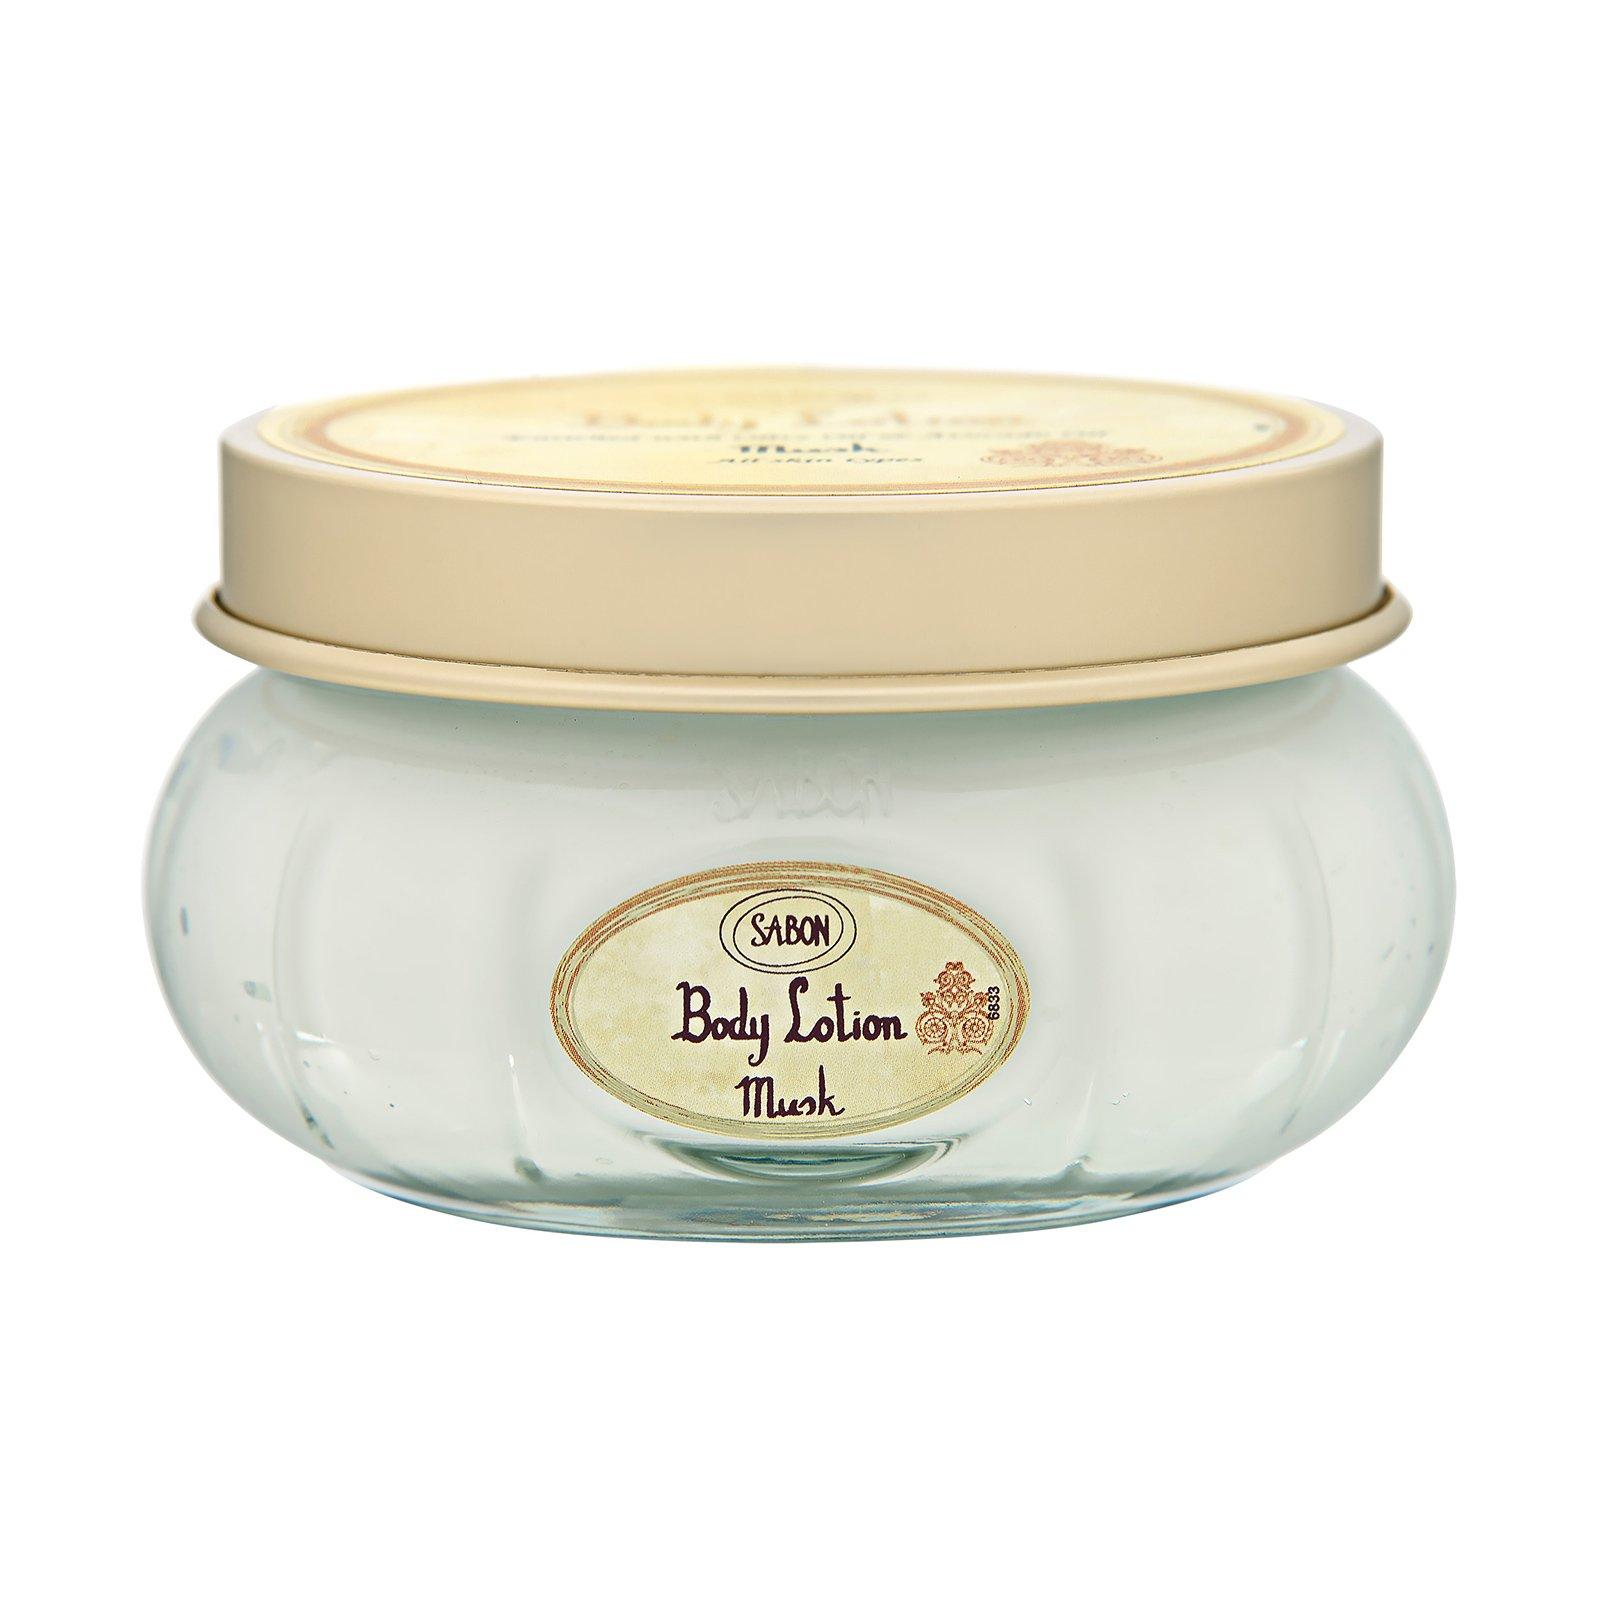 Sabon  Body Lotion (Jar) Musk, 7oz, 200ml